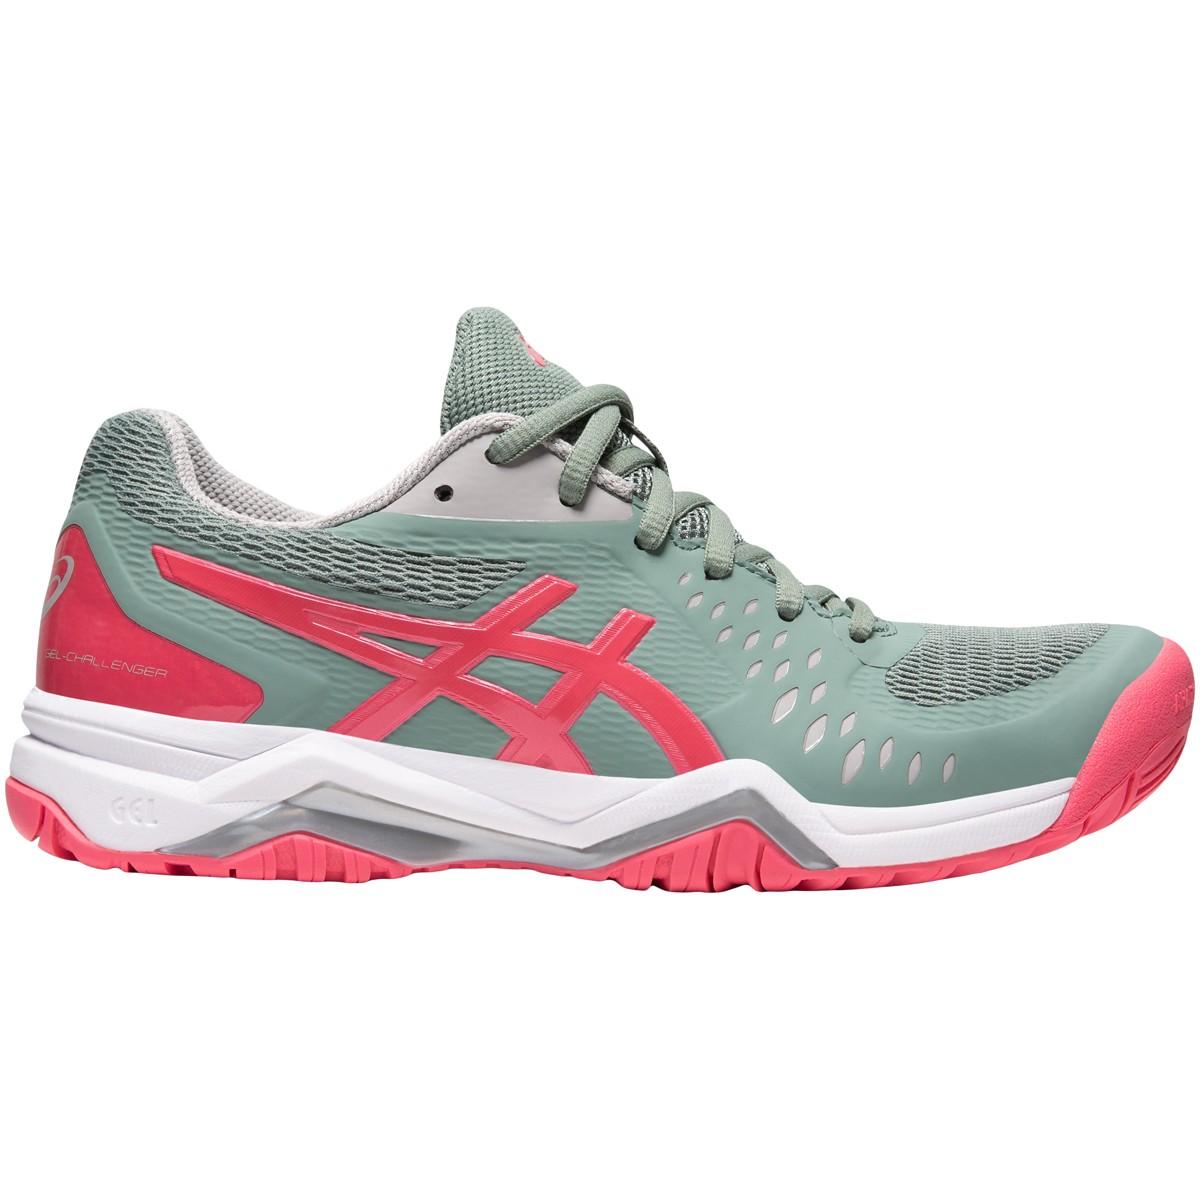 Chaussures Asics Femme Gel Challenger 12 Toutes Surfaces